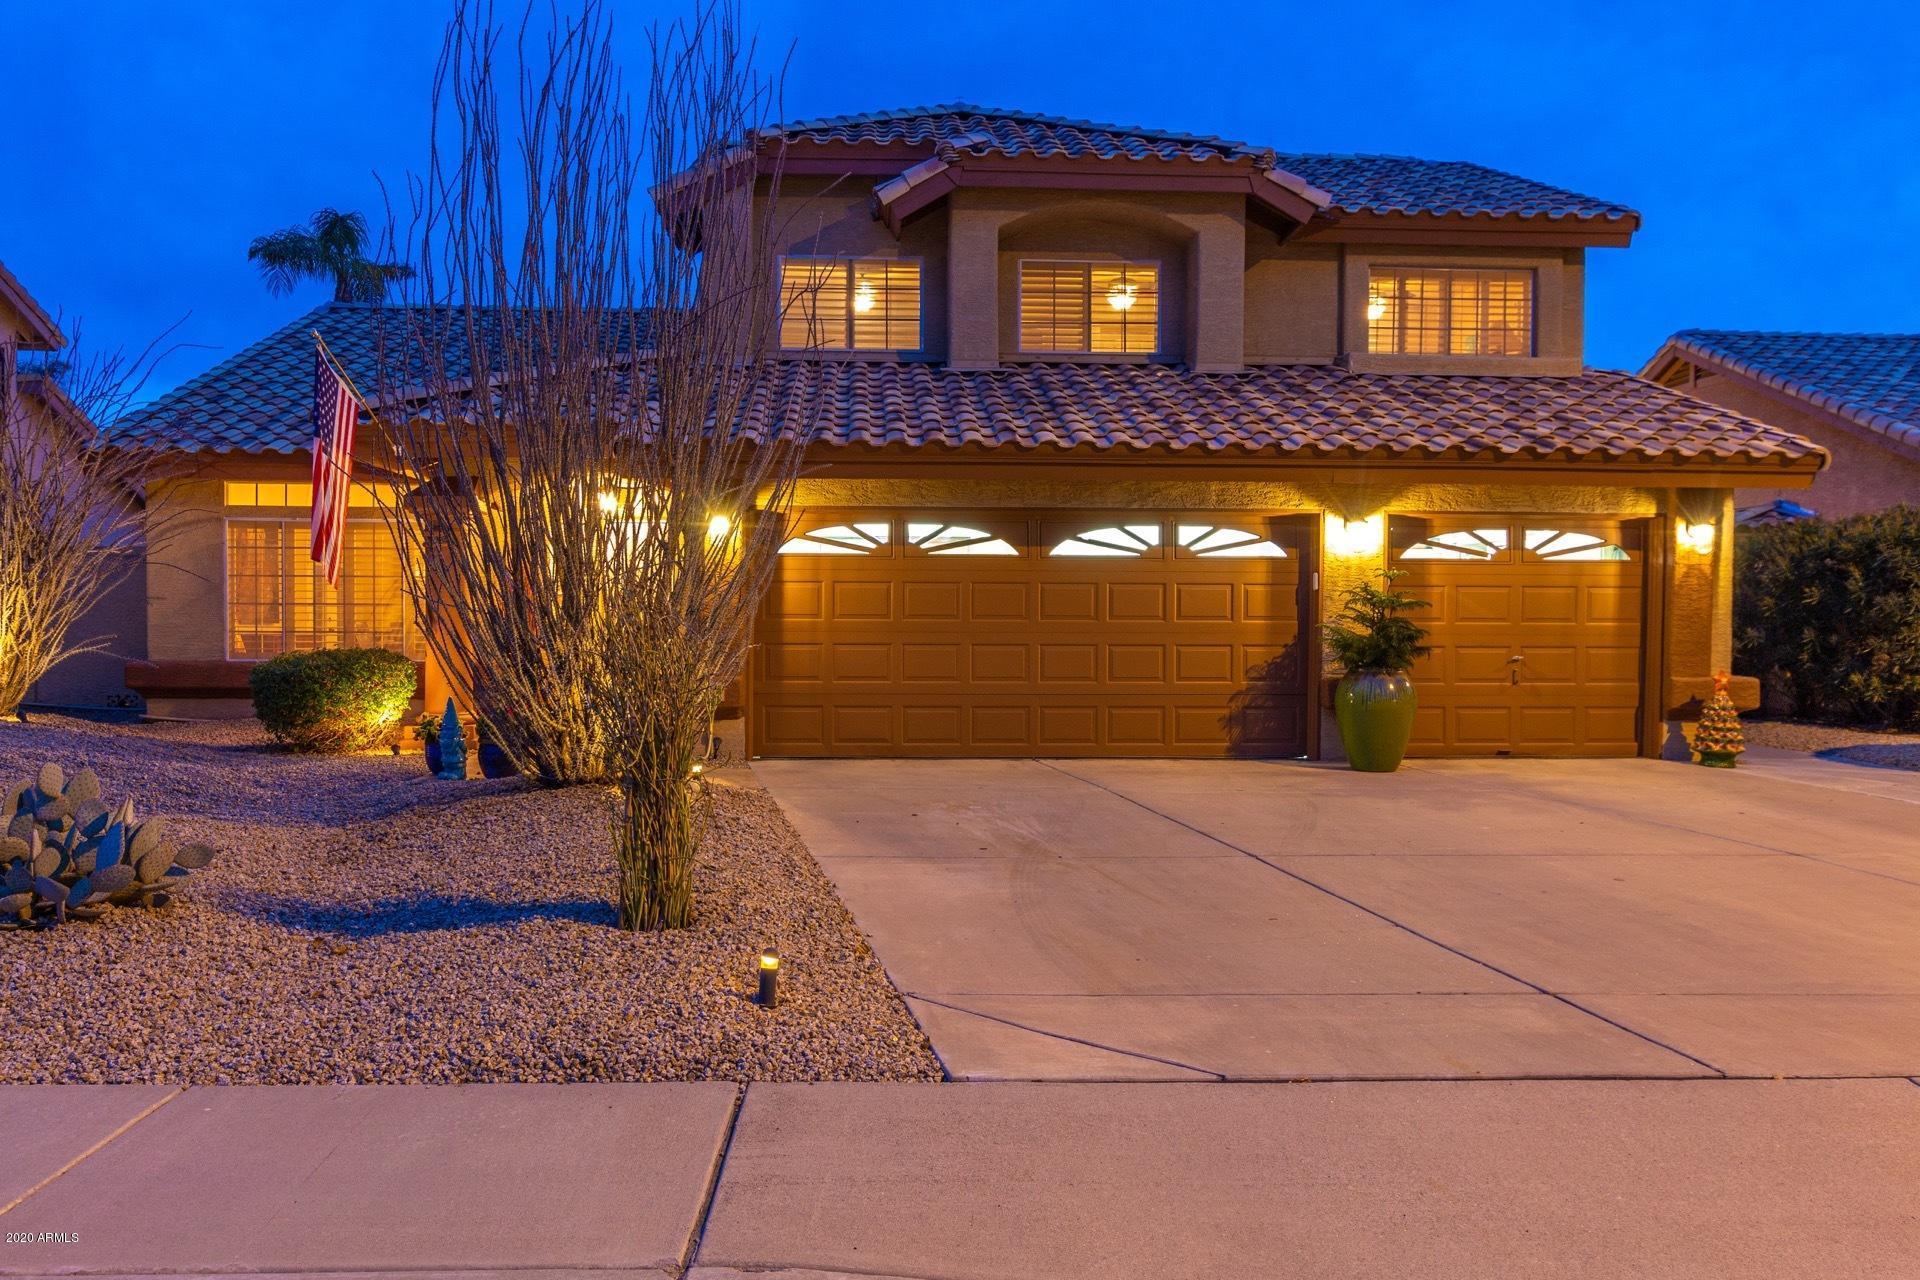 Photo of 1732 N ARDEN --, Mesa, AZ 85205